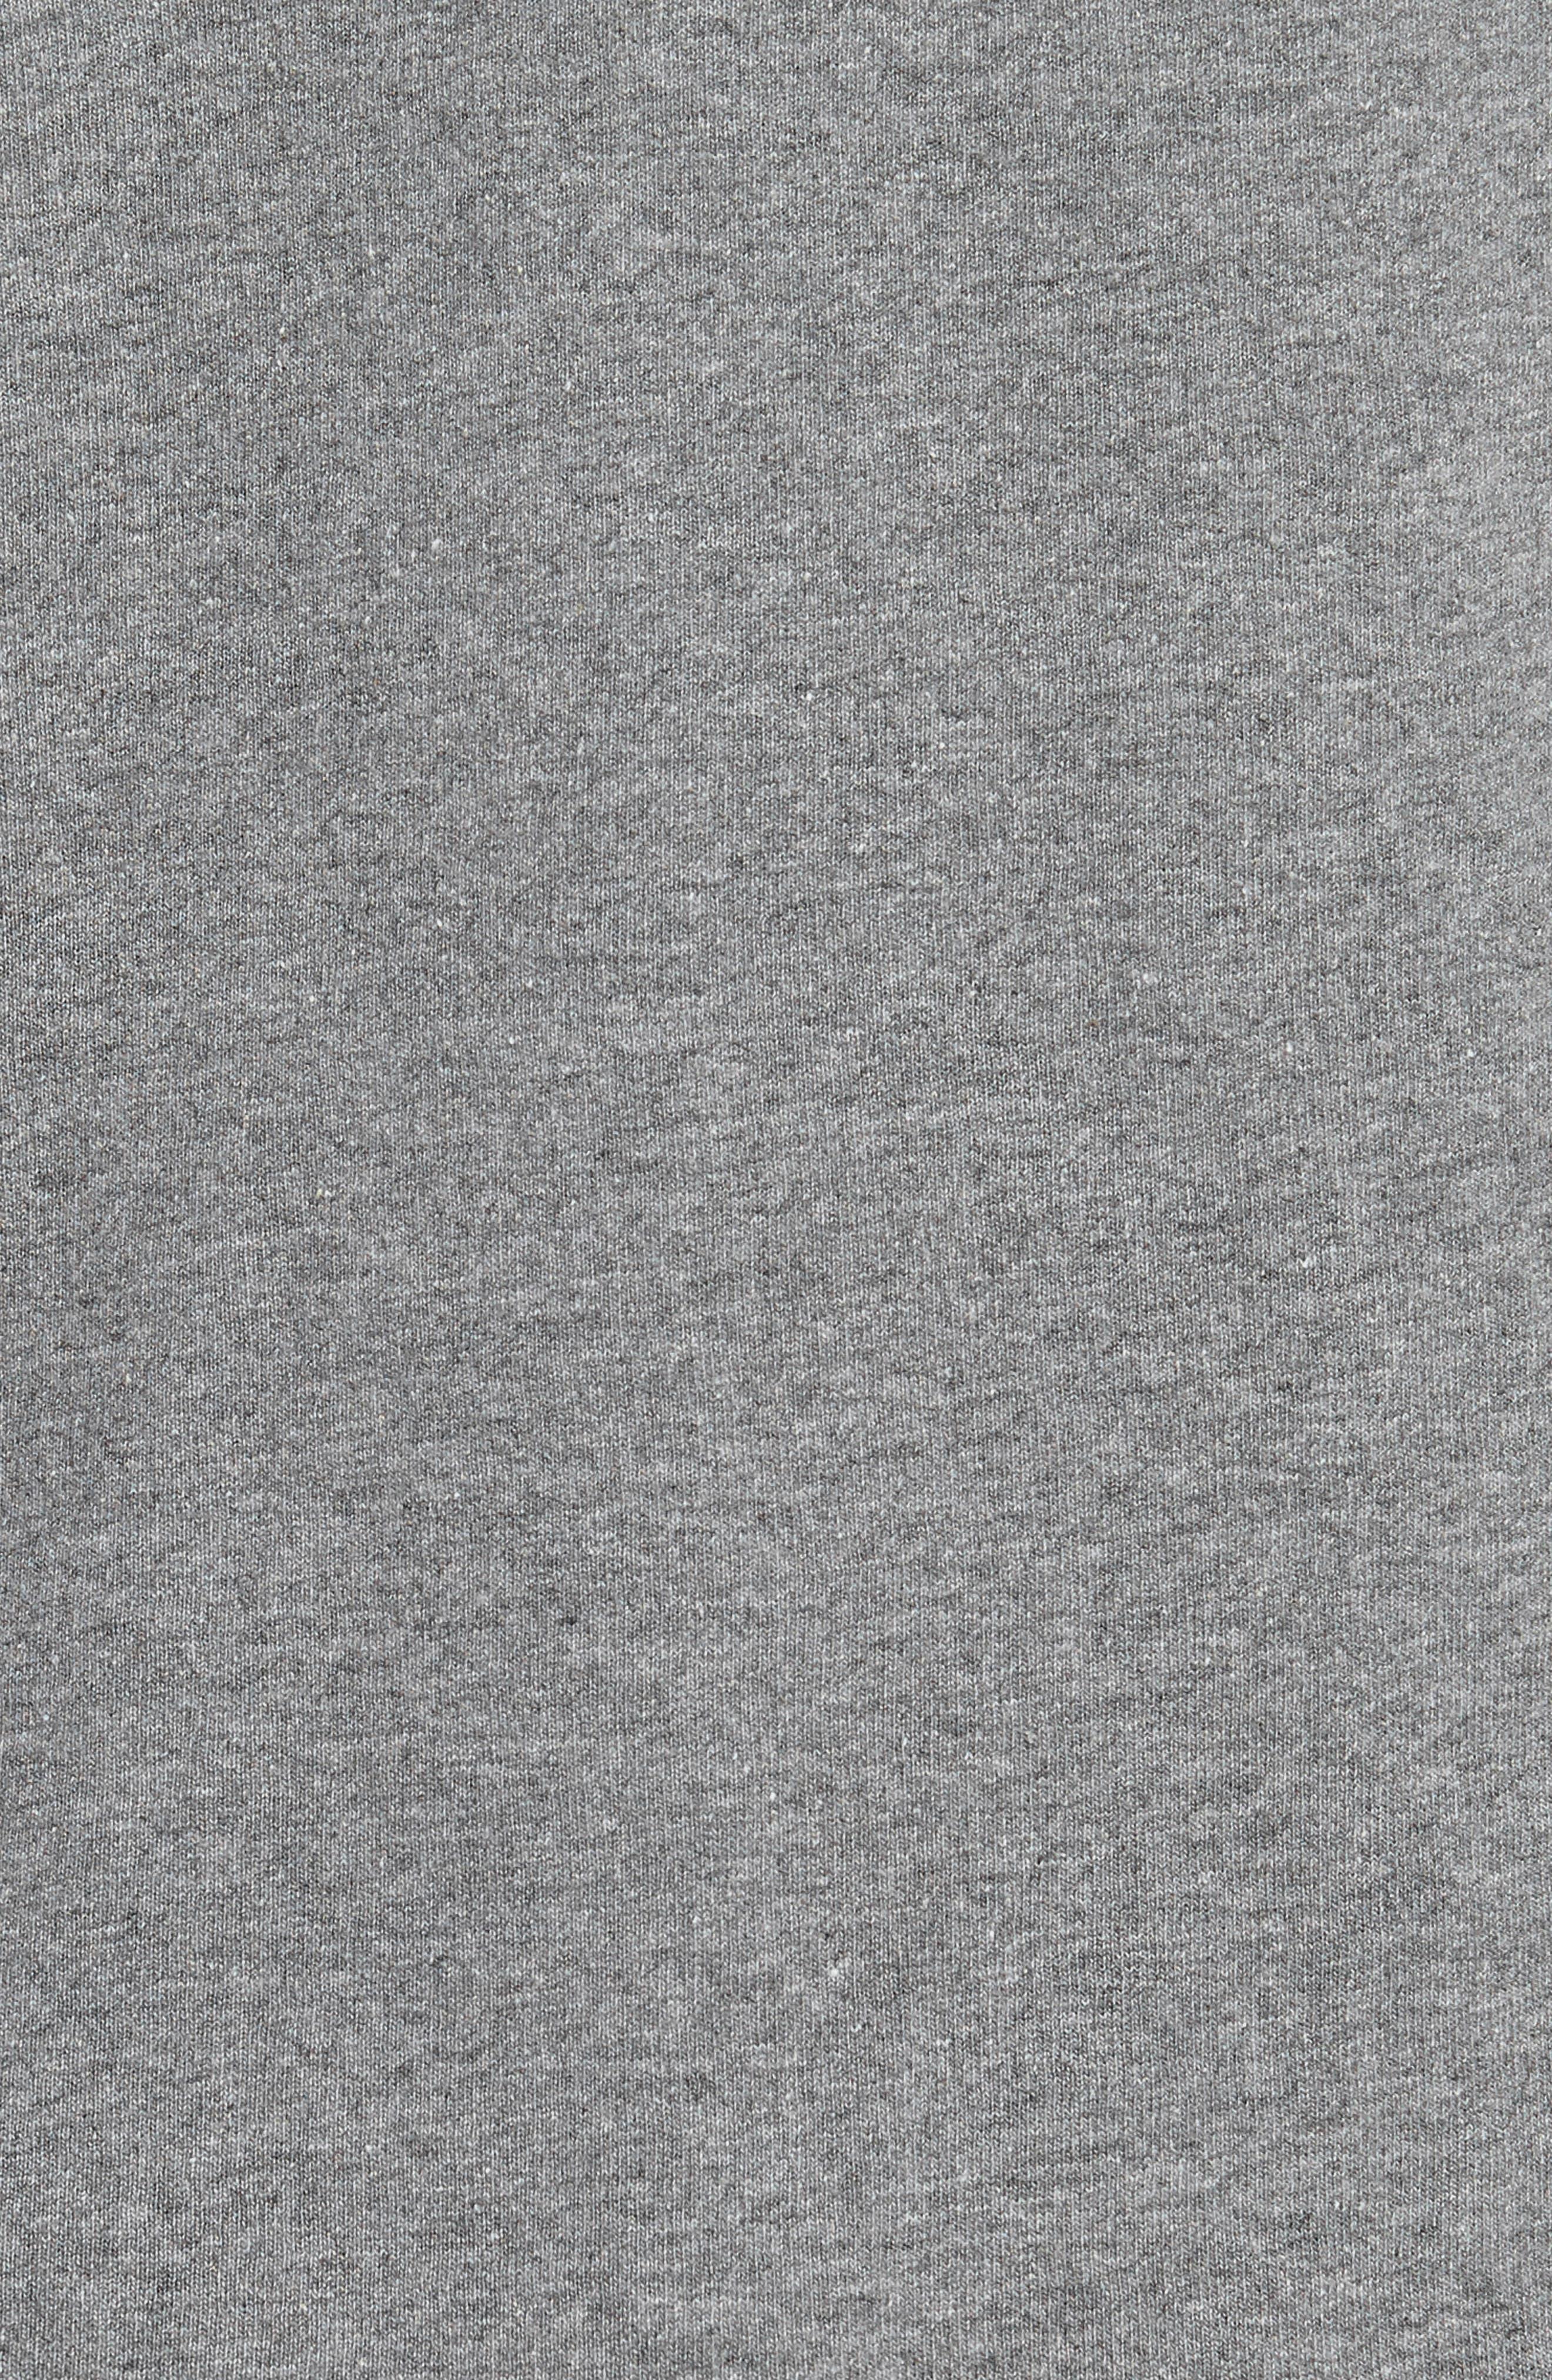 PATAGONIA,                             Fitz Roy Responsibili-Tee Long-Sleeve T-Shirt,                             Alternate thumbnail 5, color,                             020